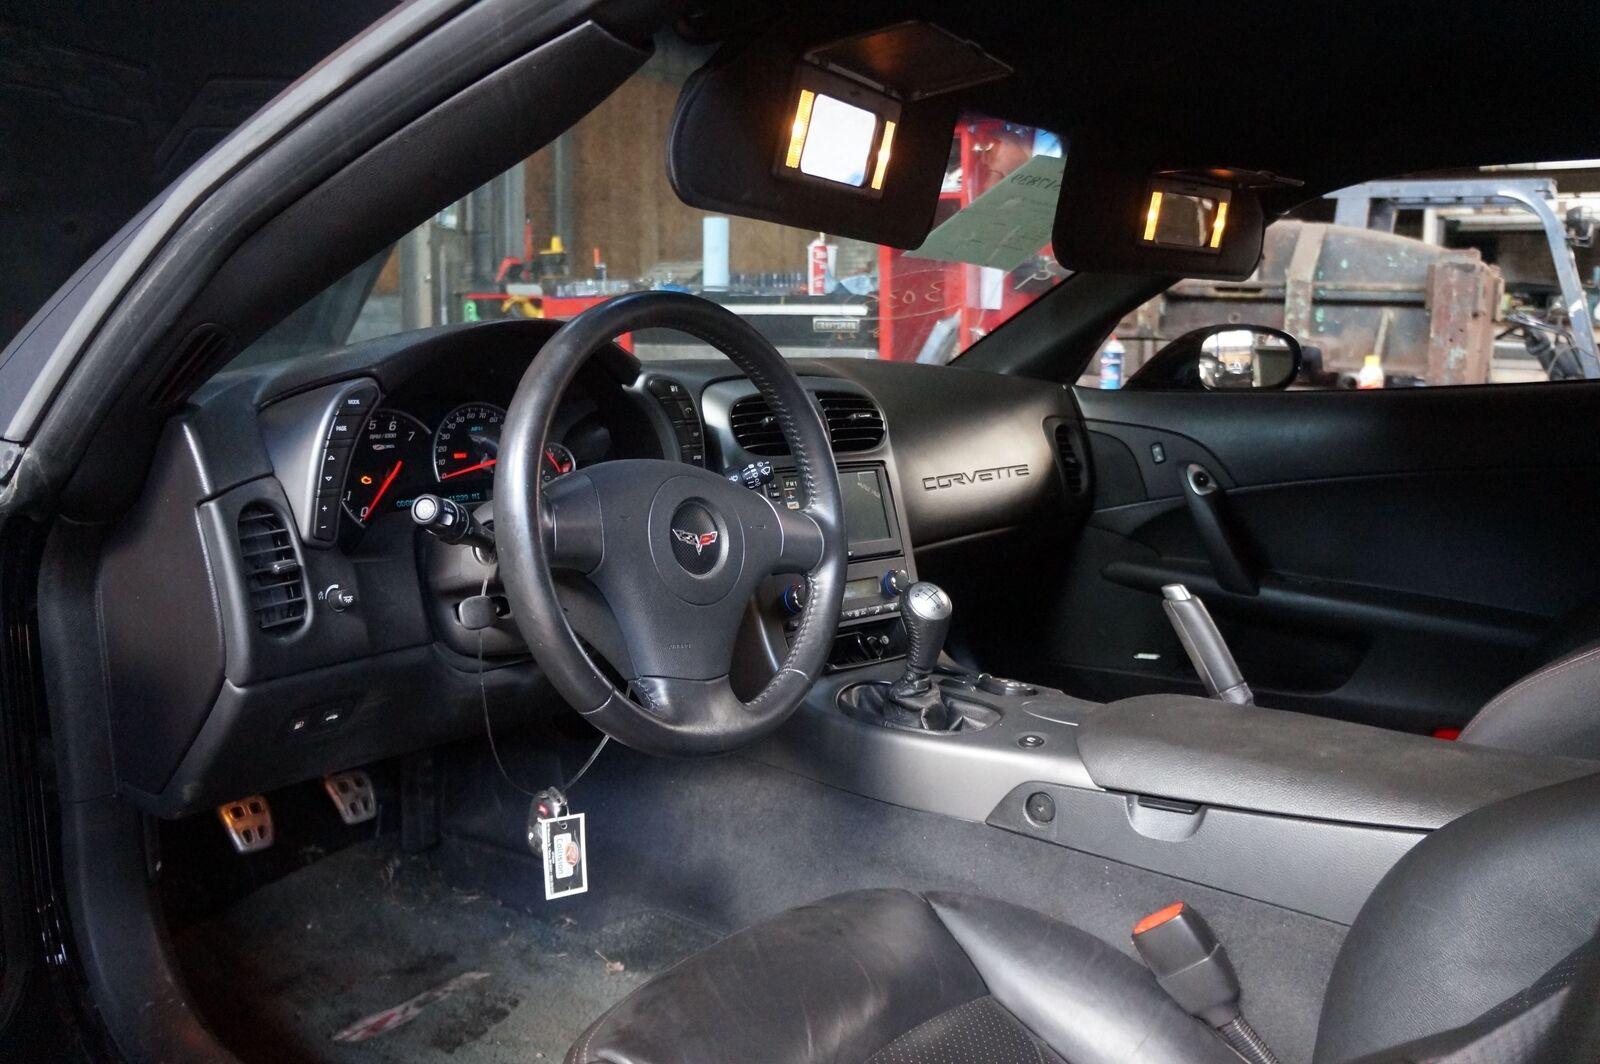 Differential Oil Cooler 15249453 OEM Chevrolet Corvette C6 2005-07